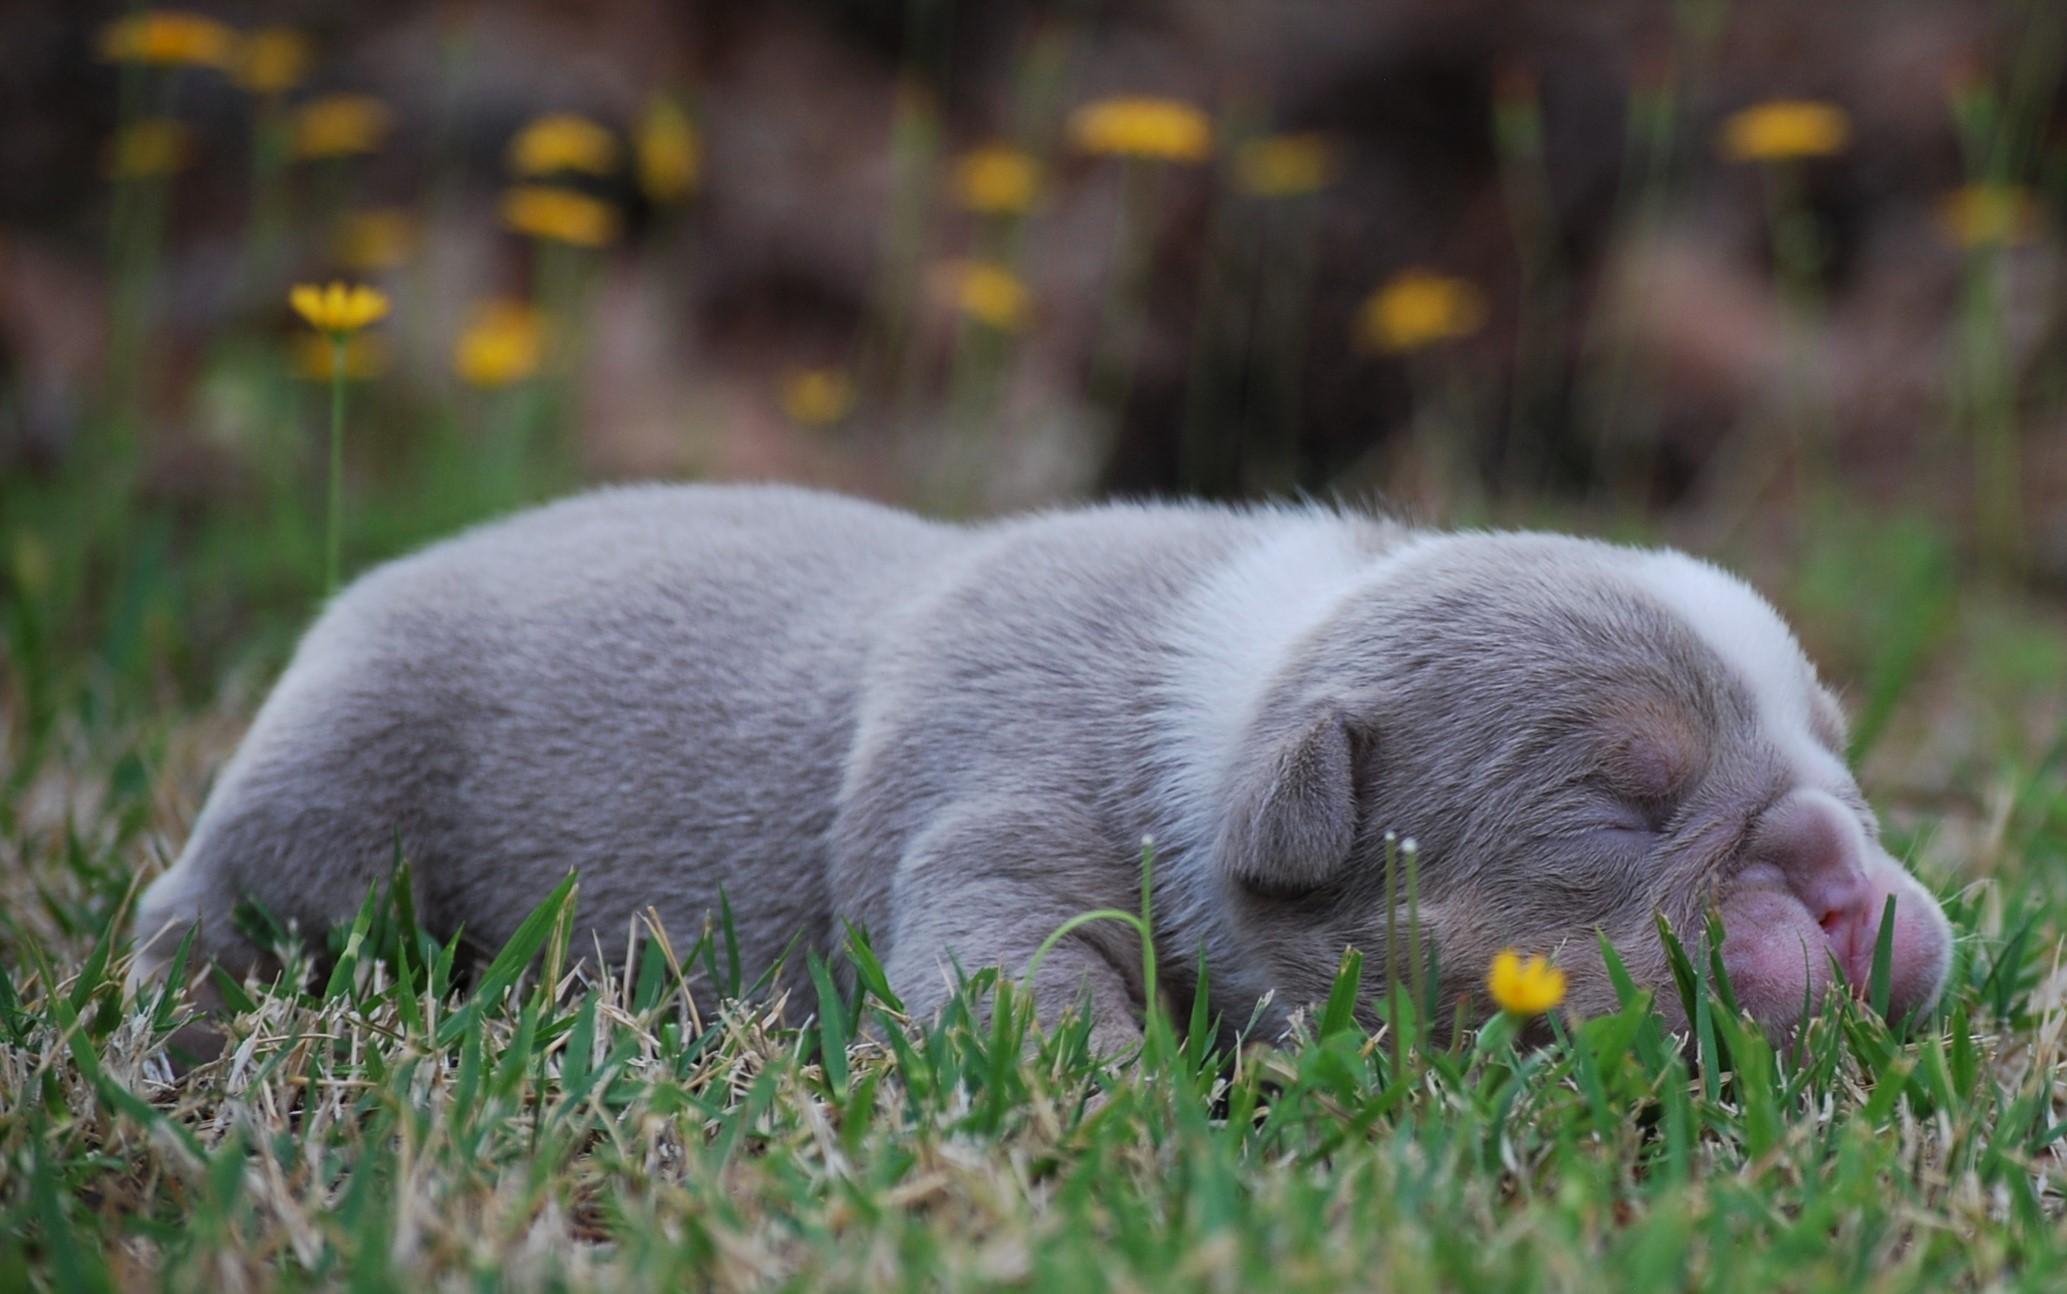 Nugget Olde English Bulldogge Puppy For Sale | Photo 1